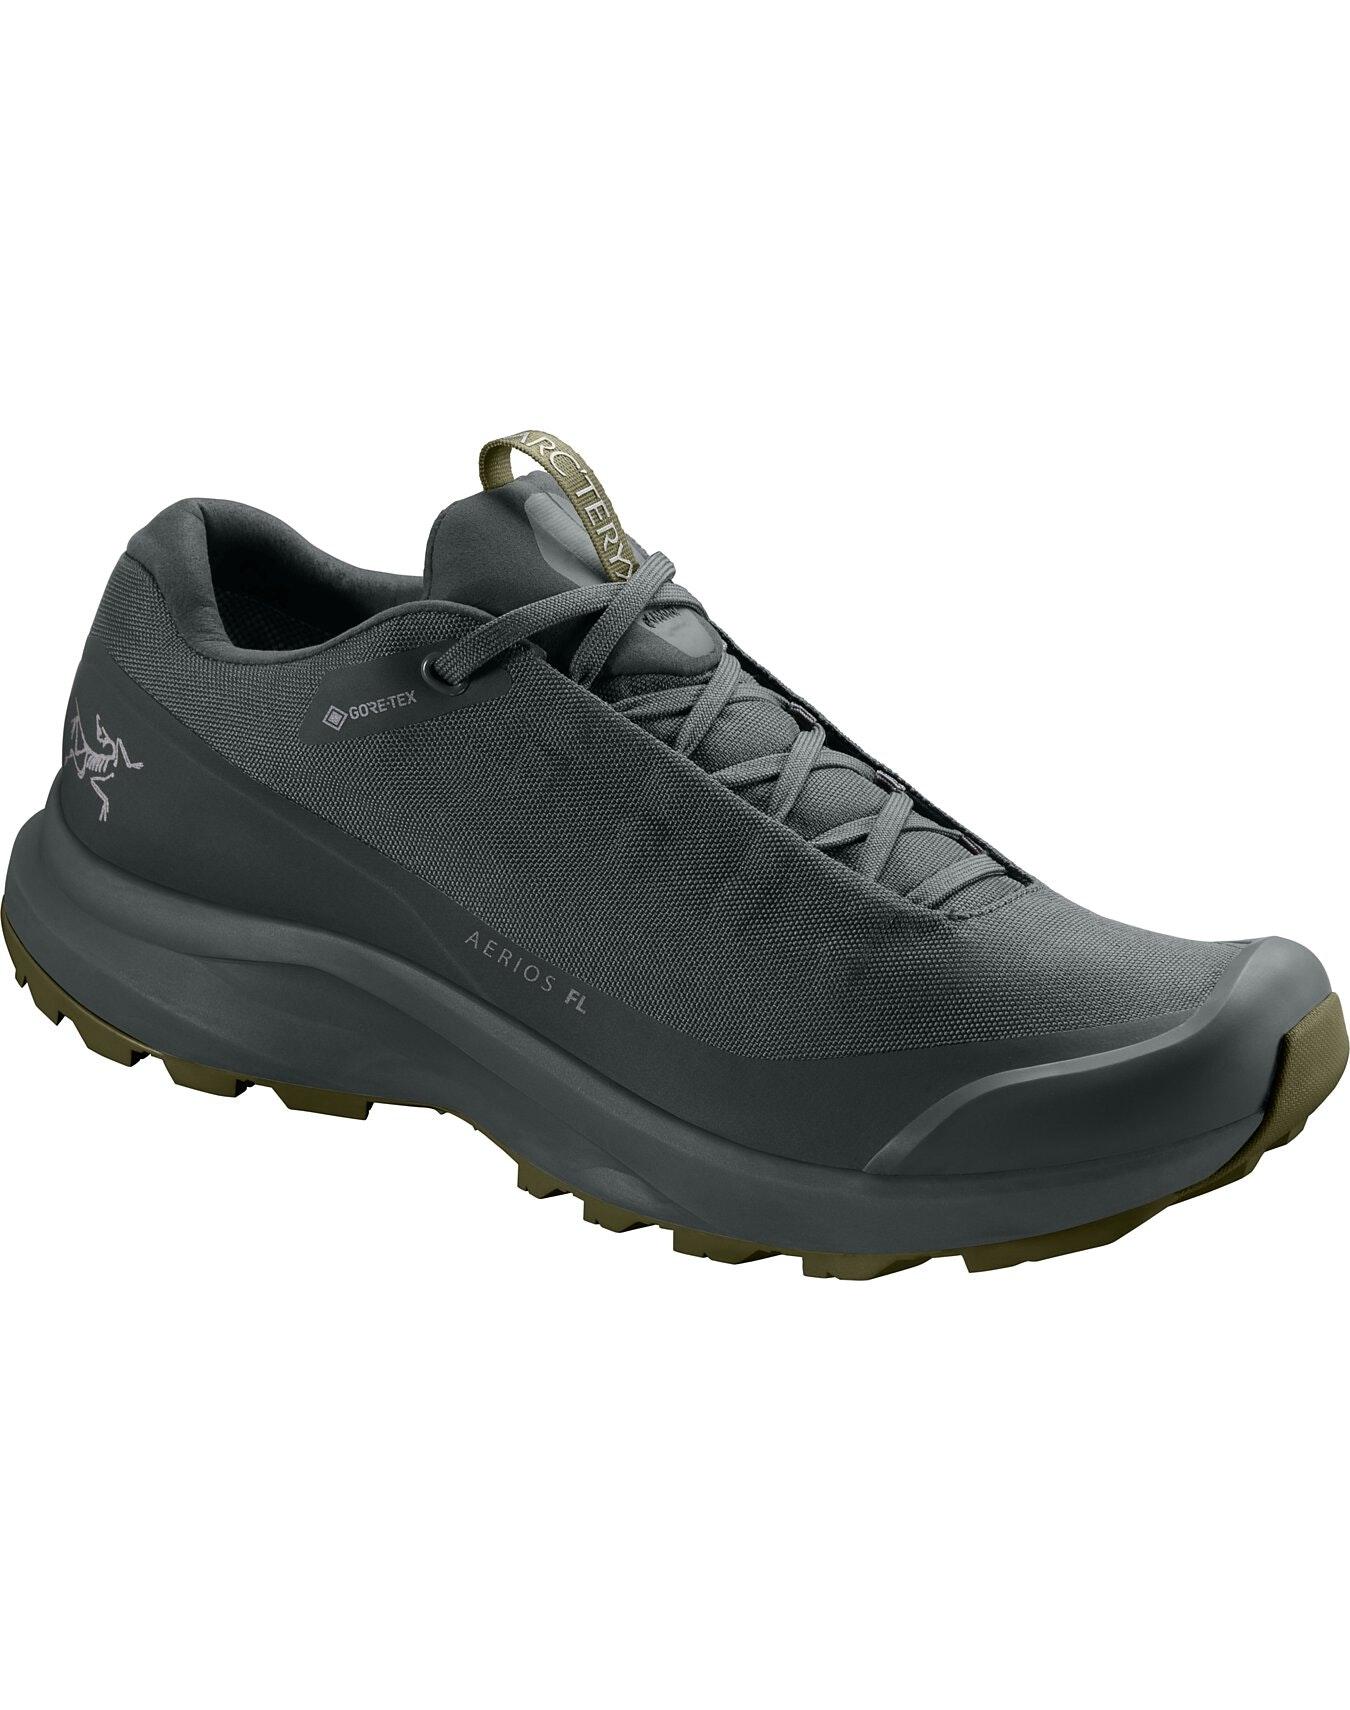 Aerios FL GTX Shoe CINDER/Bushwack